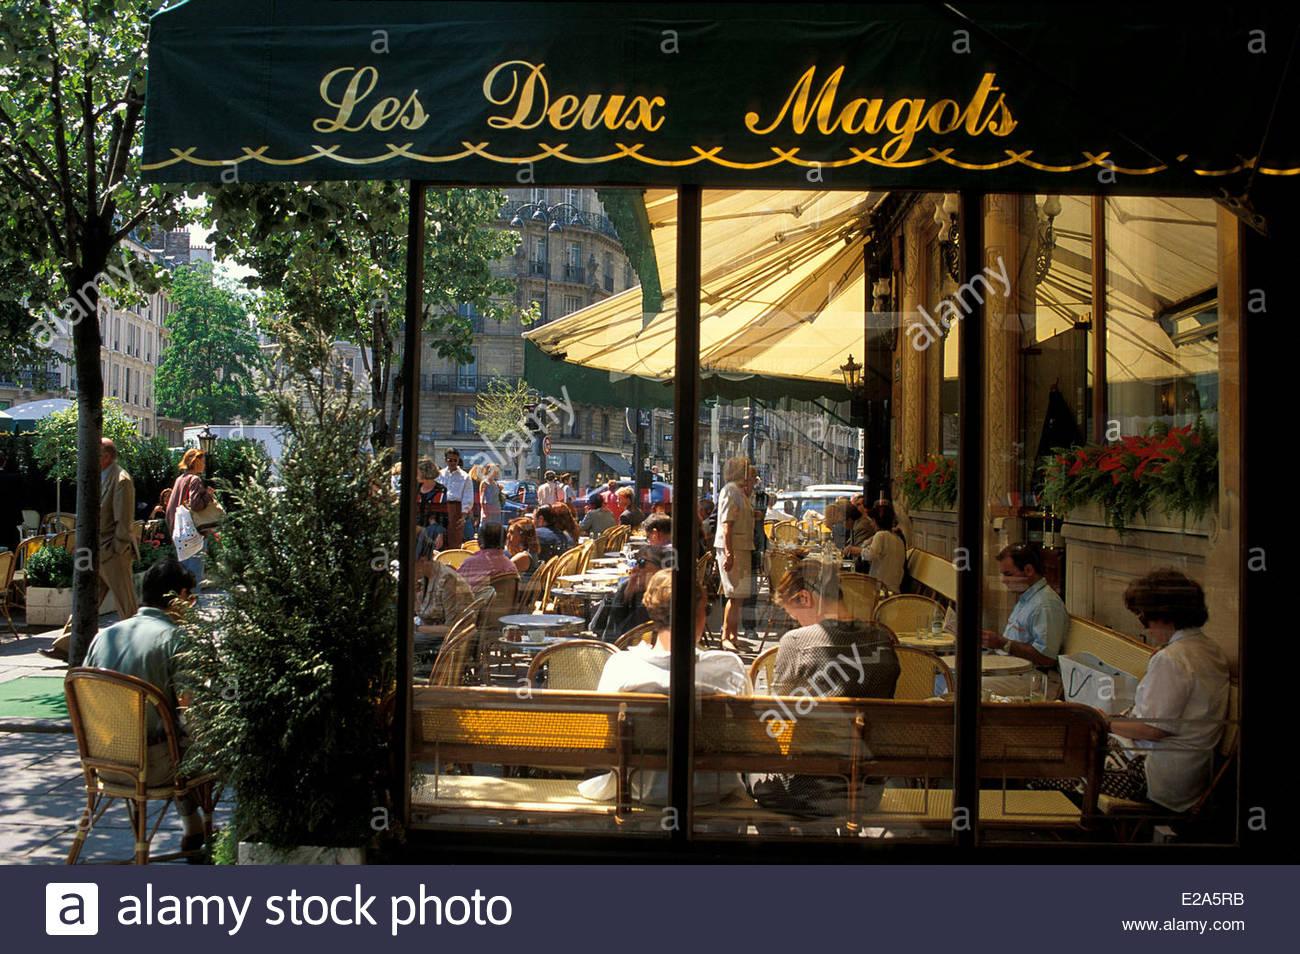 Risultati immagini per CAFFE' PARIS LES DEUX MAGOTS